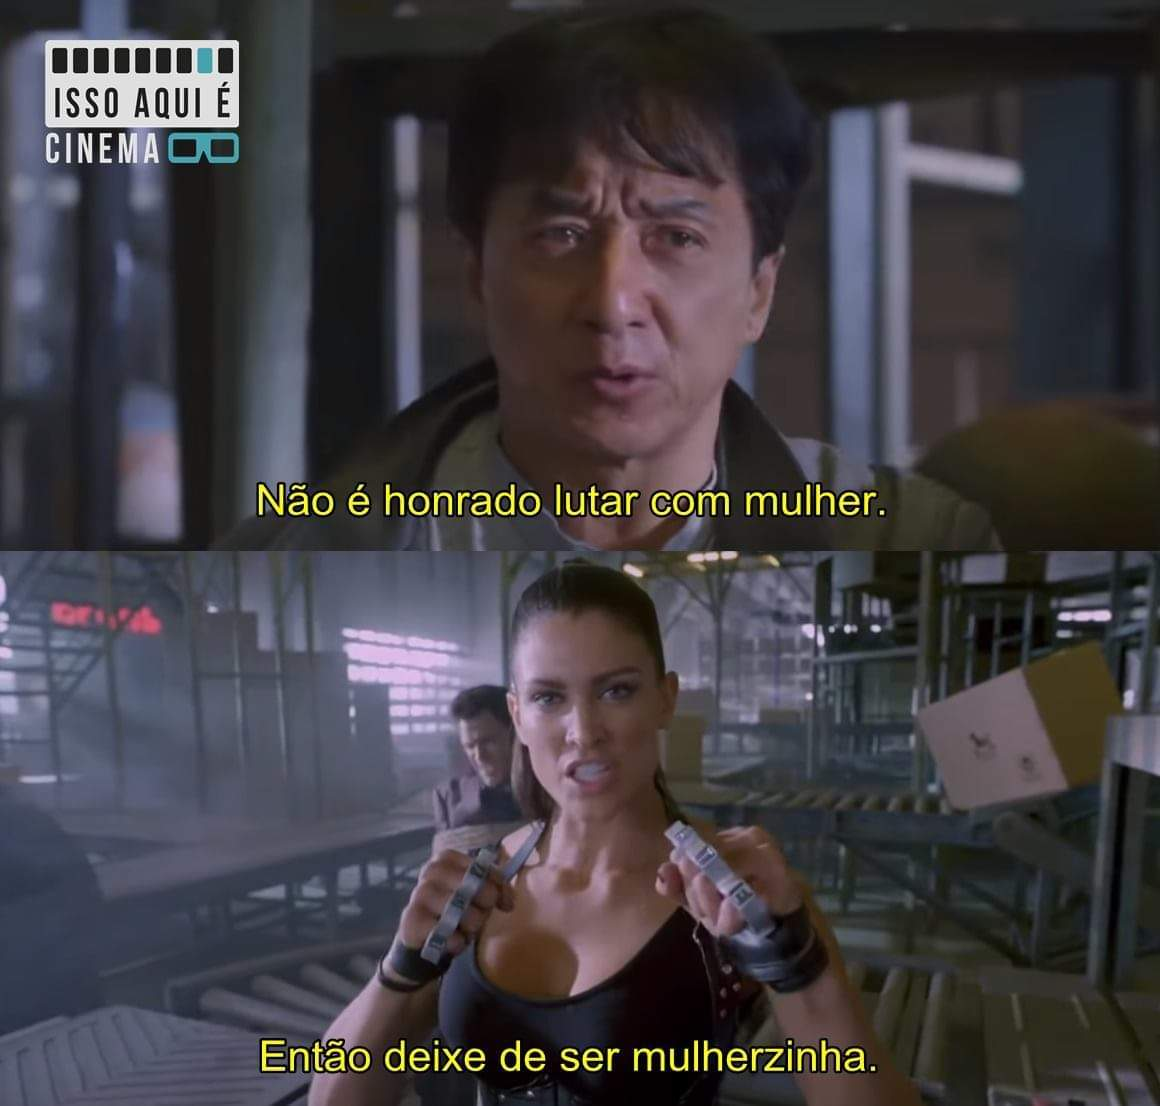 Fora do rumo (2016) - meme